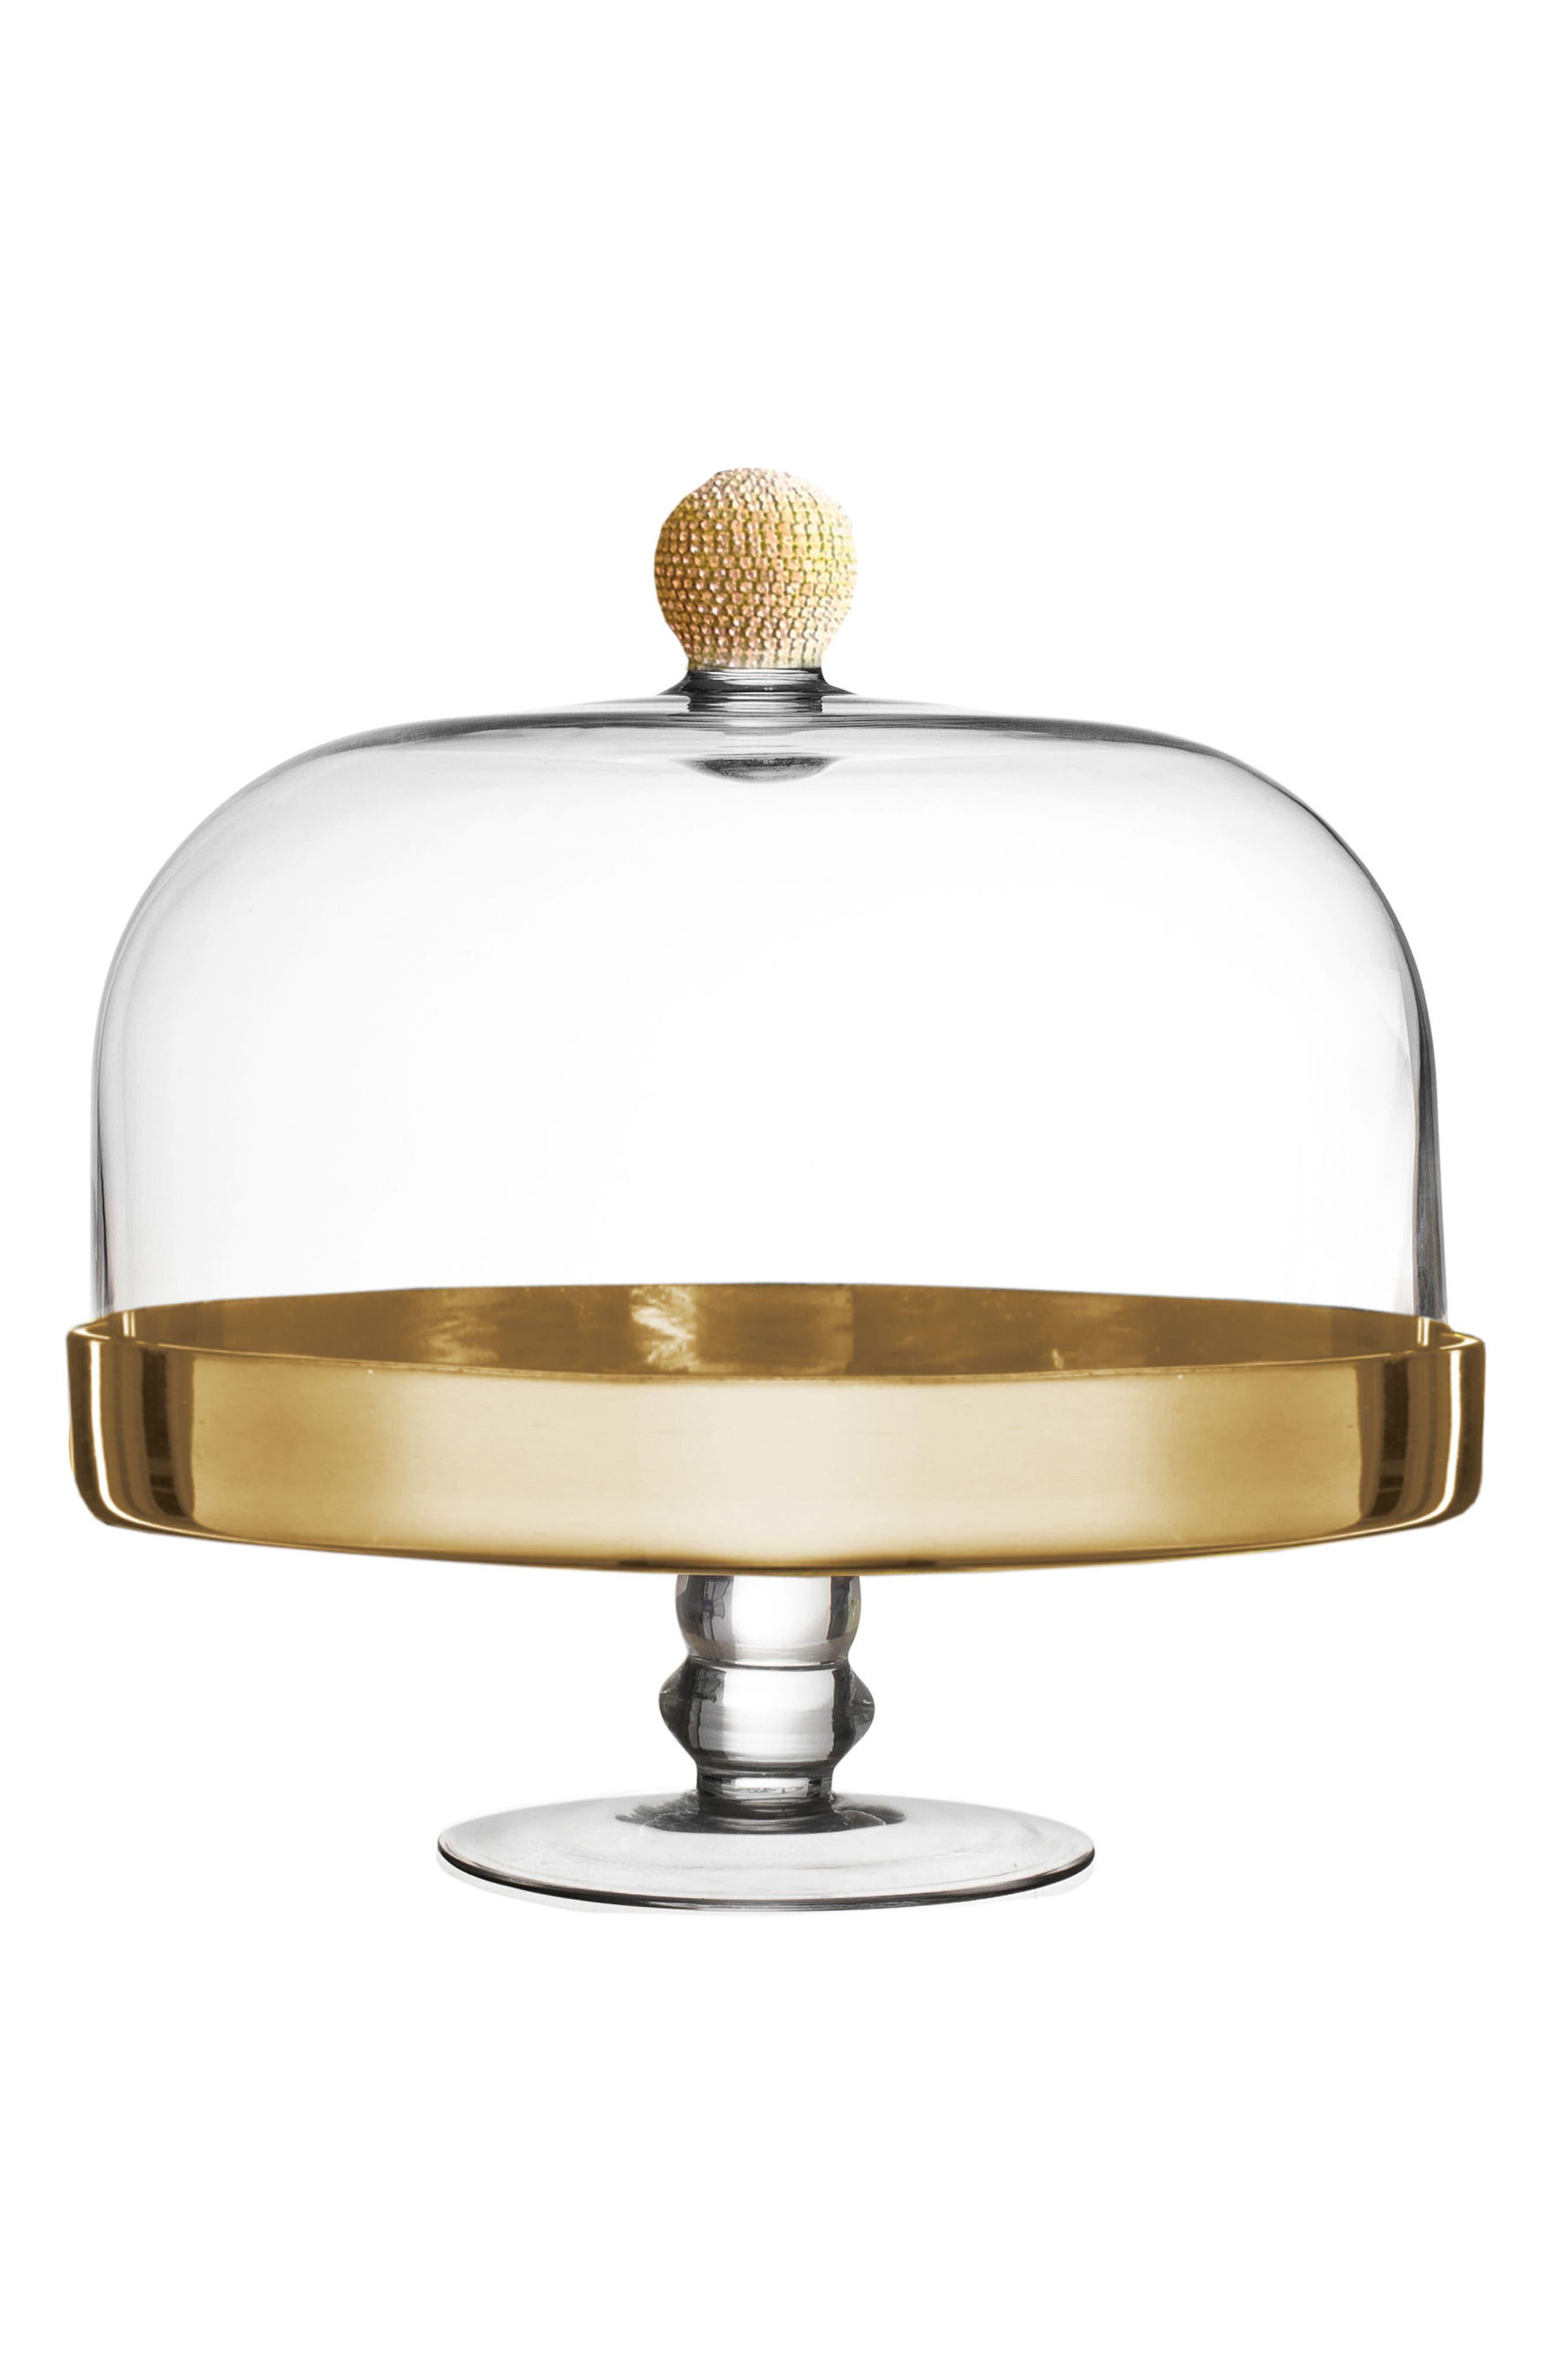 Gold Medley Pedestal Plate & Dome,                             Main thumbnail 1, color,                             Gold